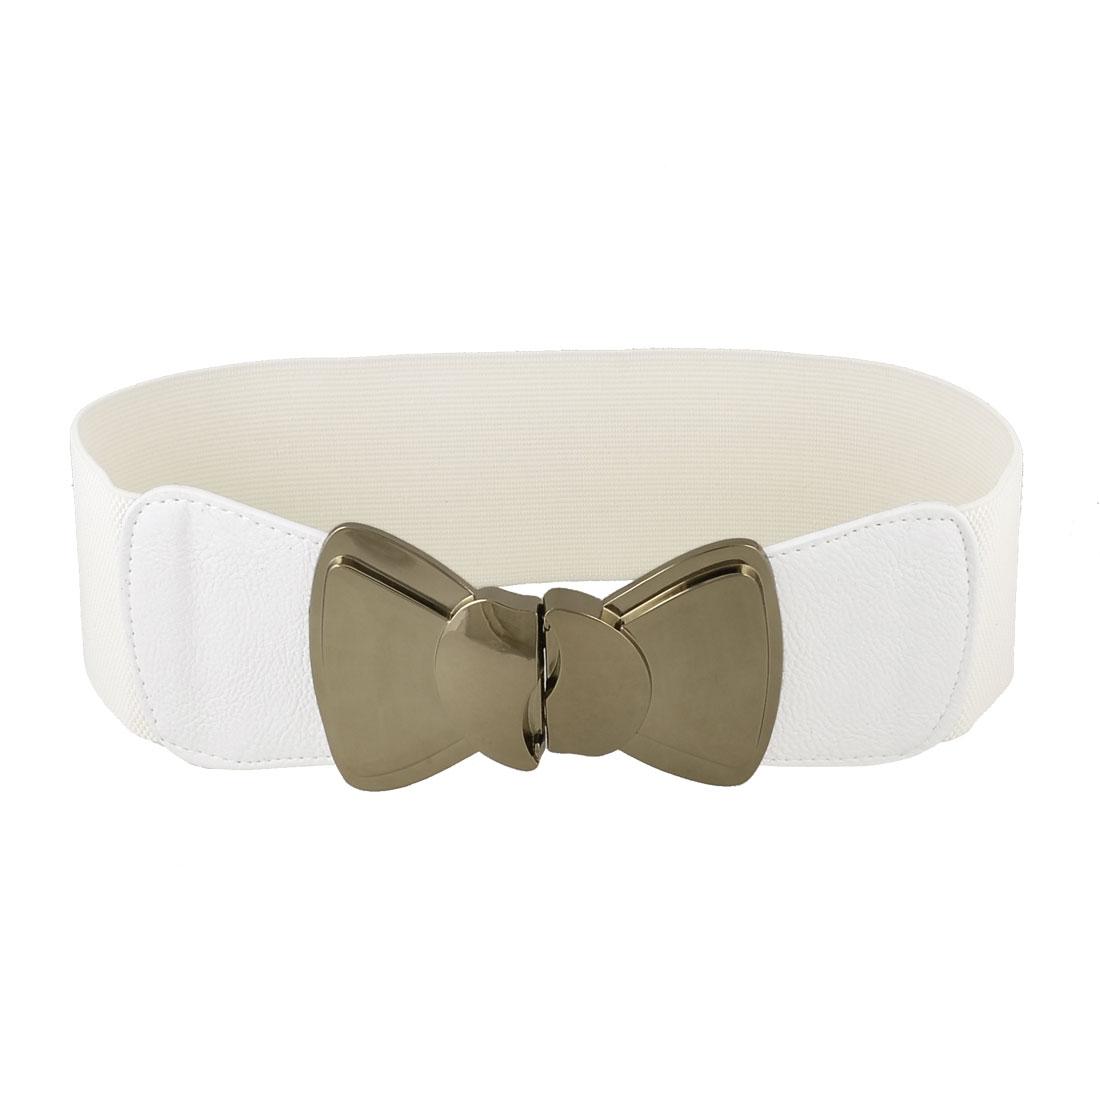 Bowtie Decor Interlock Buckle 7.5cm Wide Elastic Waist Belt Band Waistband White